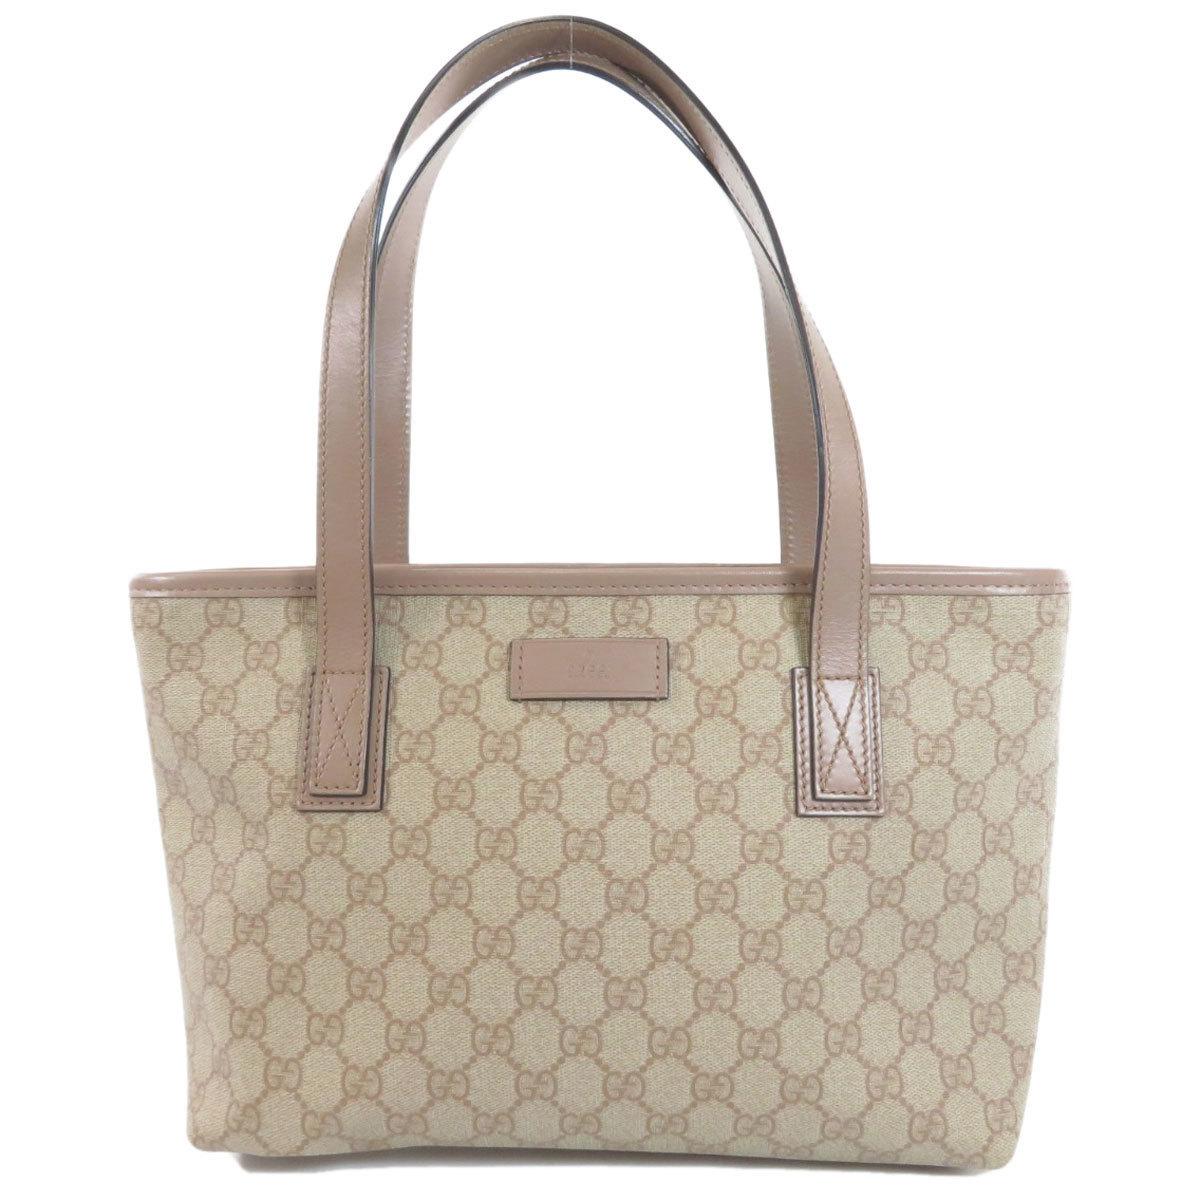 Gucci 211138 GG Supreme Tote Bag PVC Leather Ladies